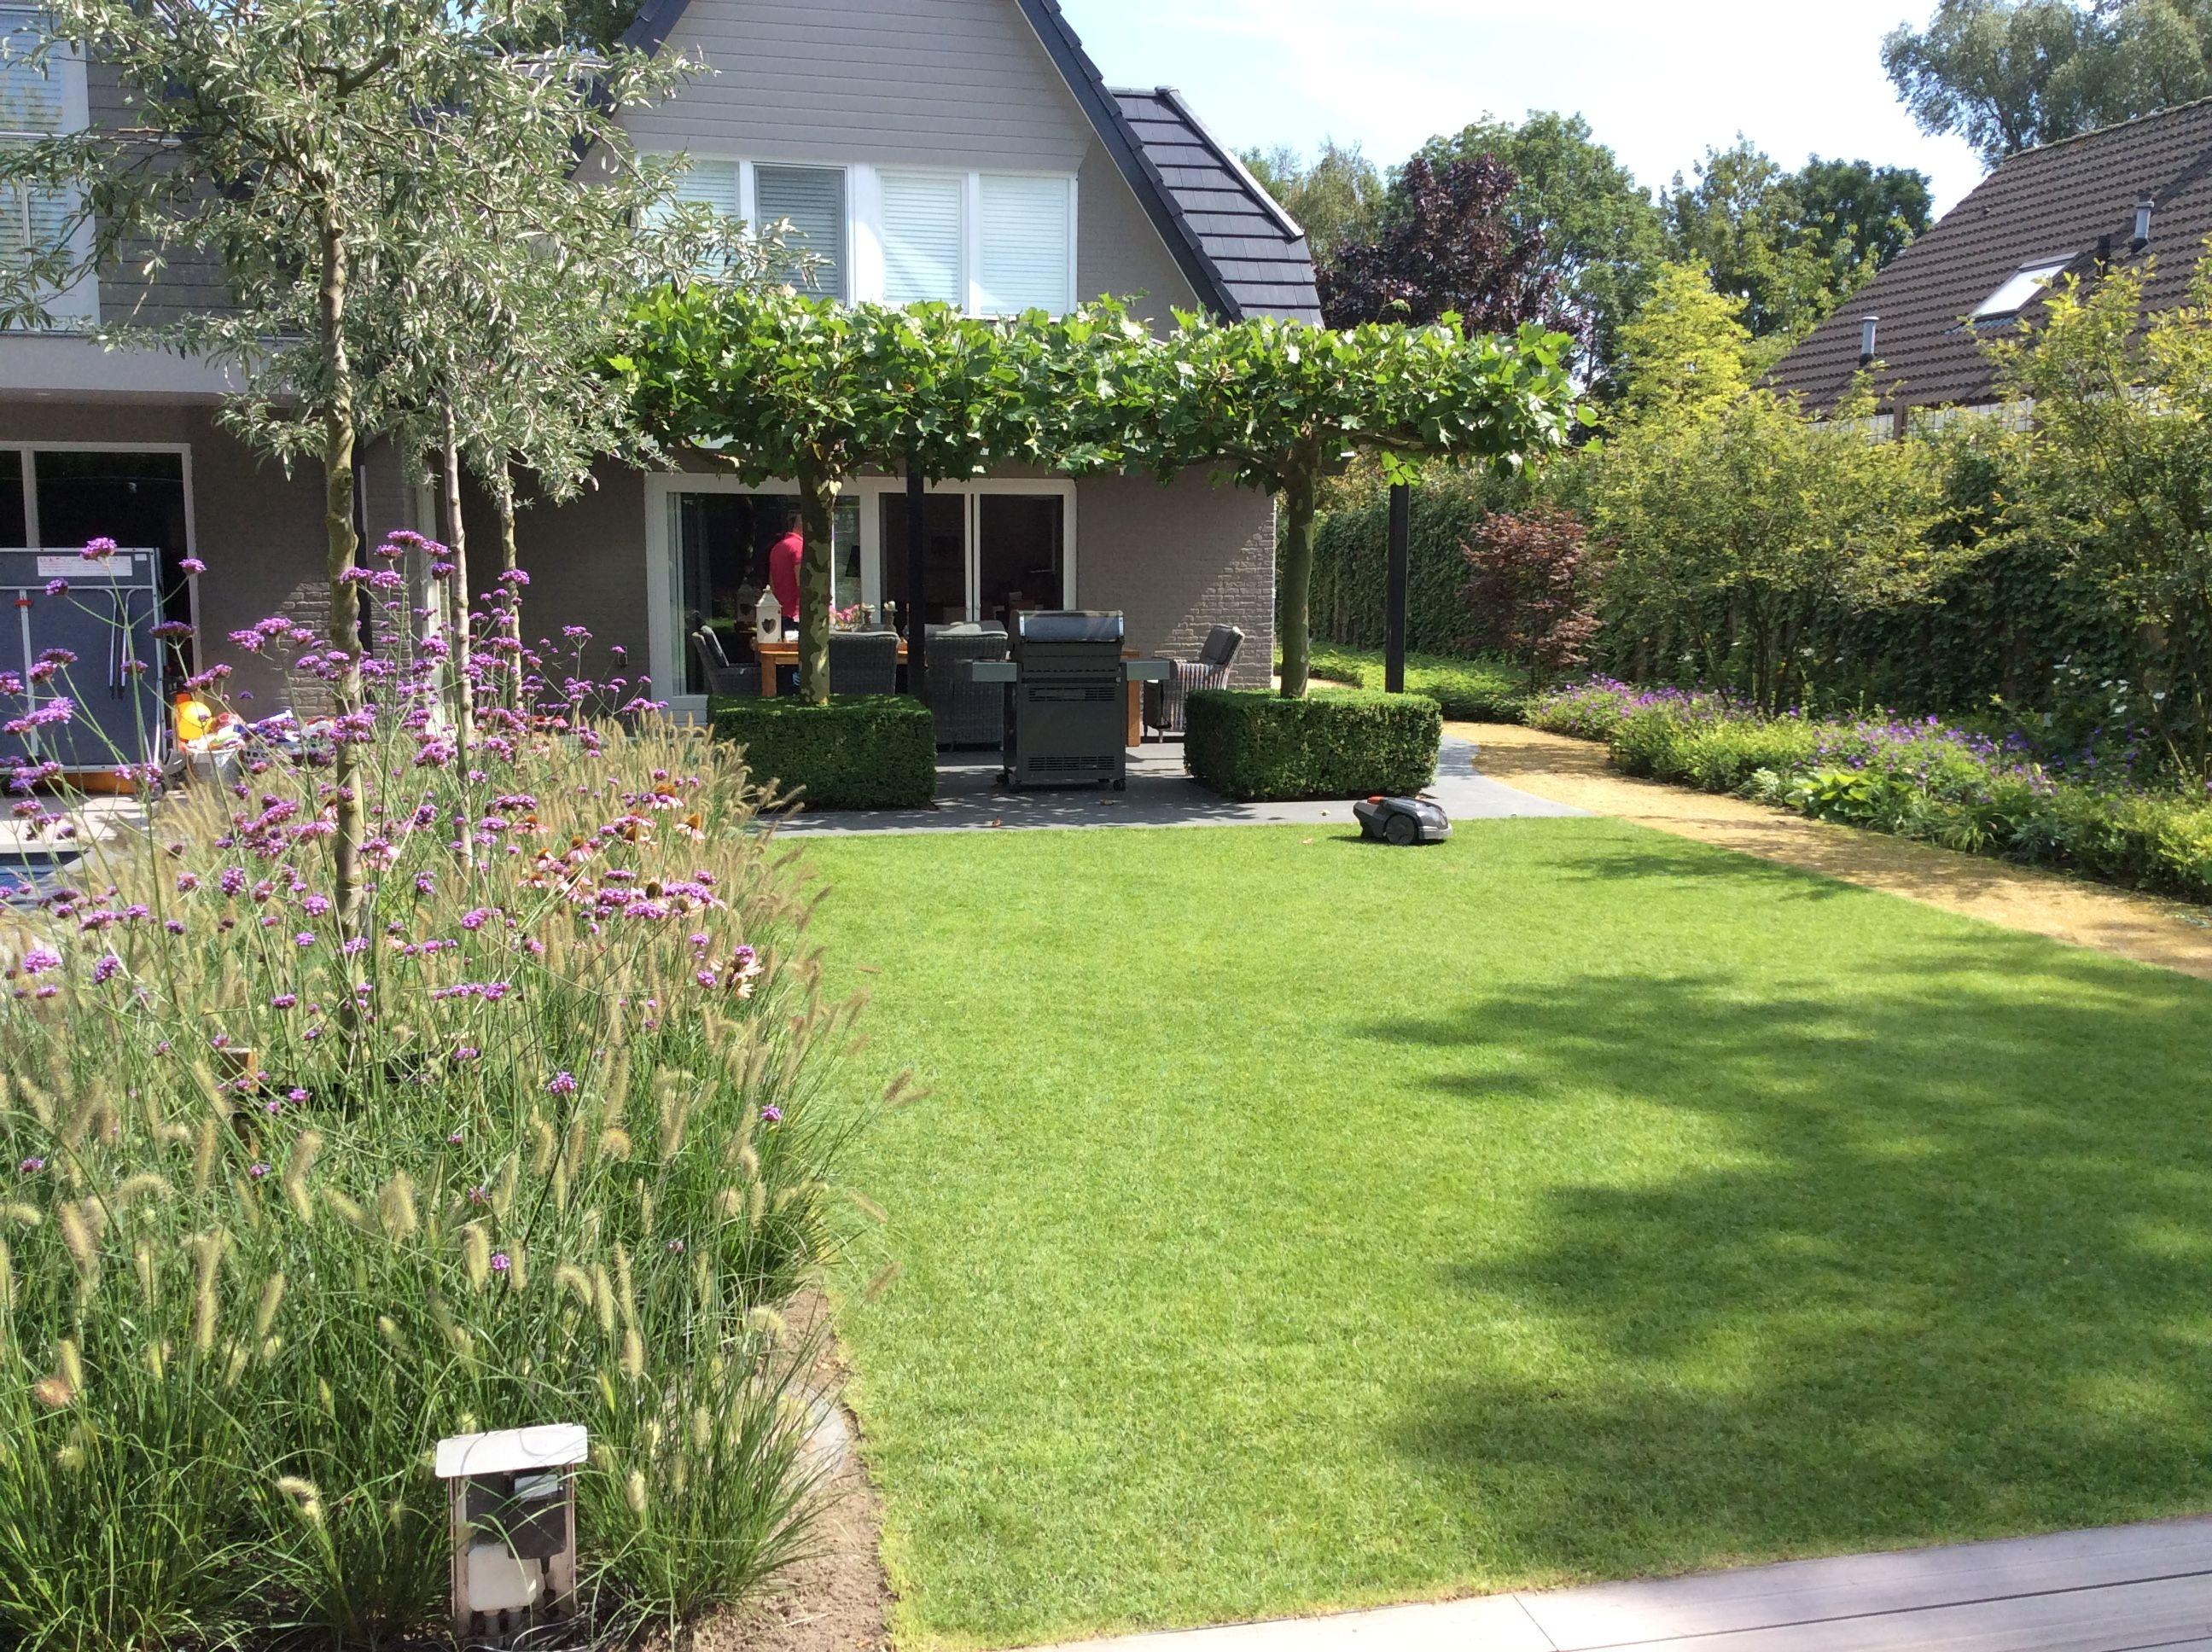 Pin by gerald helsen on helsen tuinen pinterest gardens - Eigentijdse landscaping ...